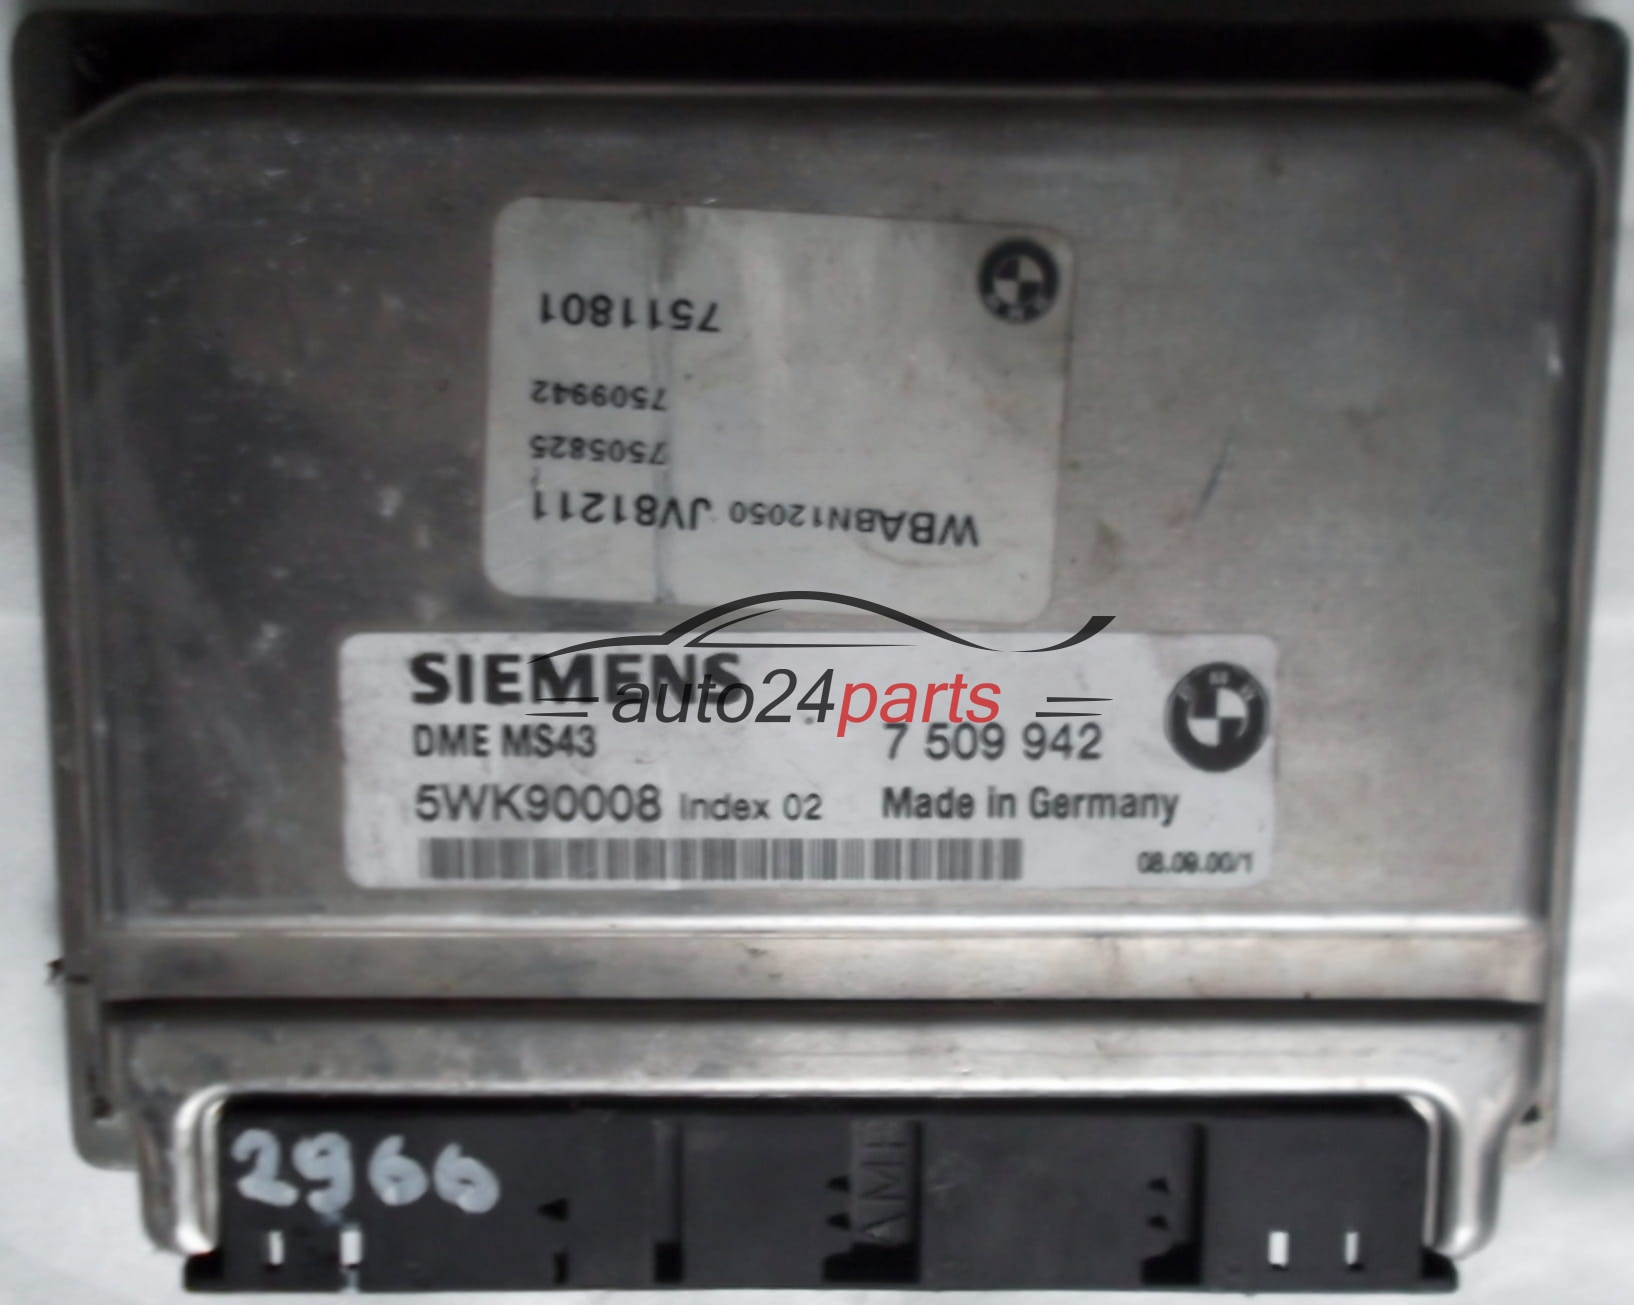 Image Of Bmw E46 Dme BMW E46 316i N42 Programmable Control Unit DME